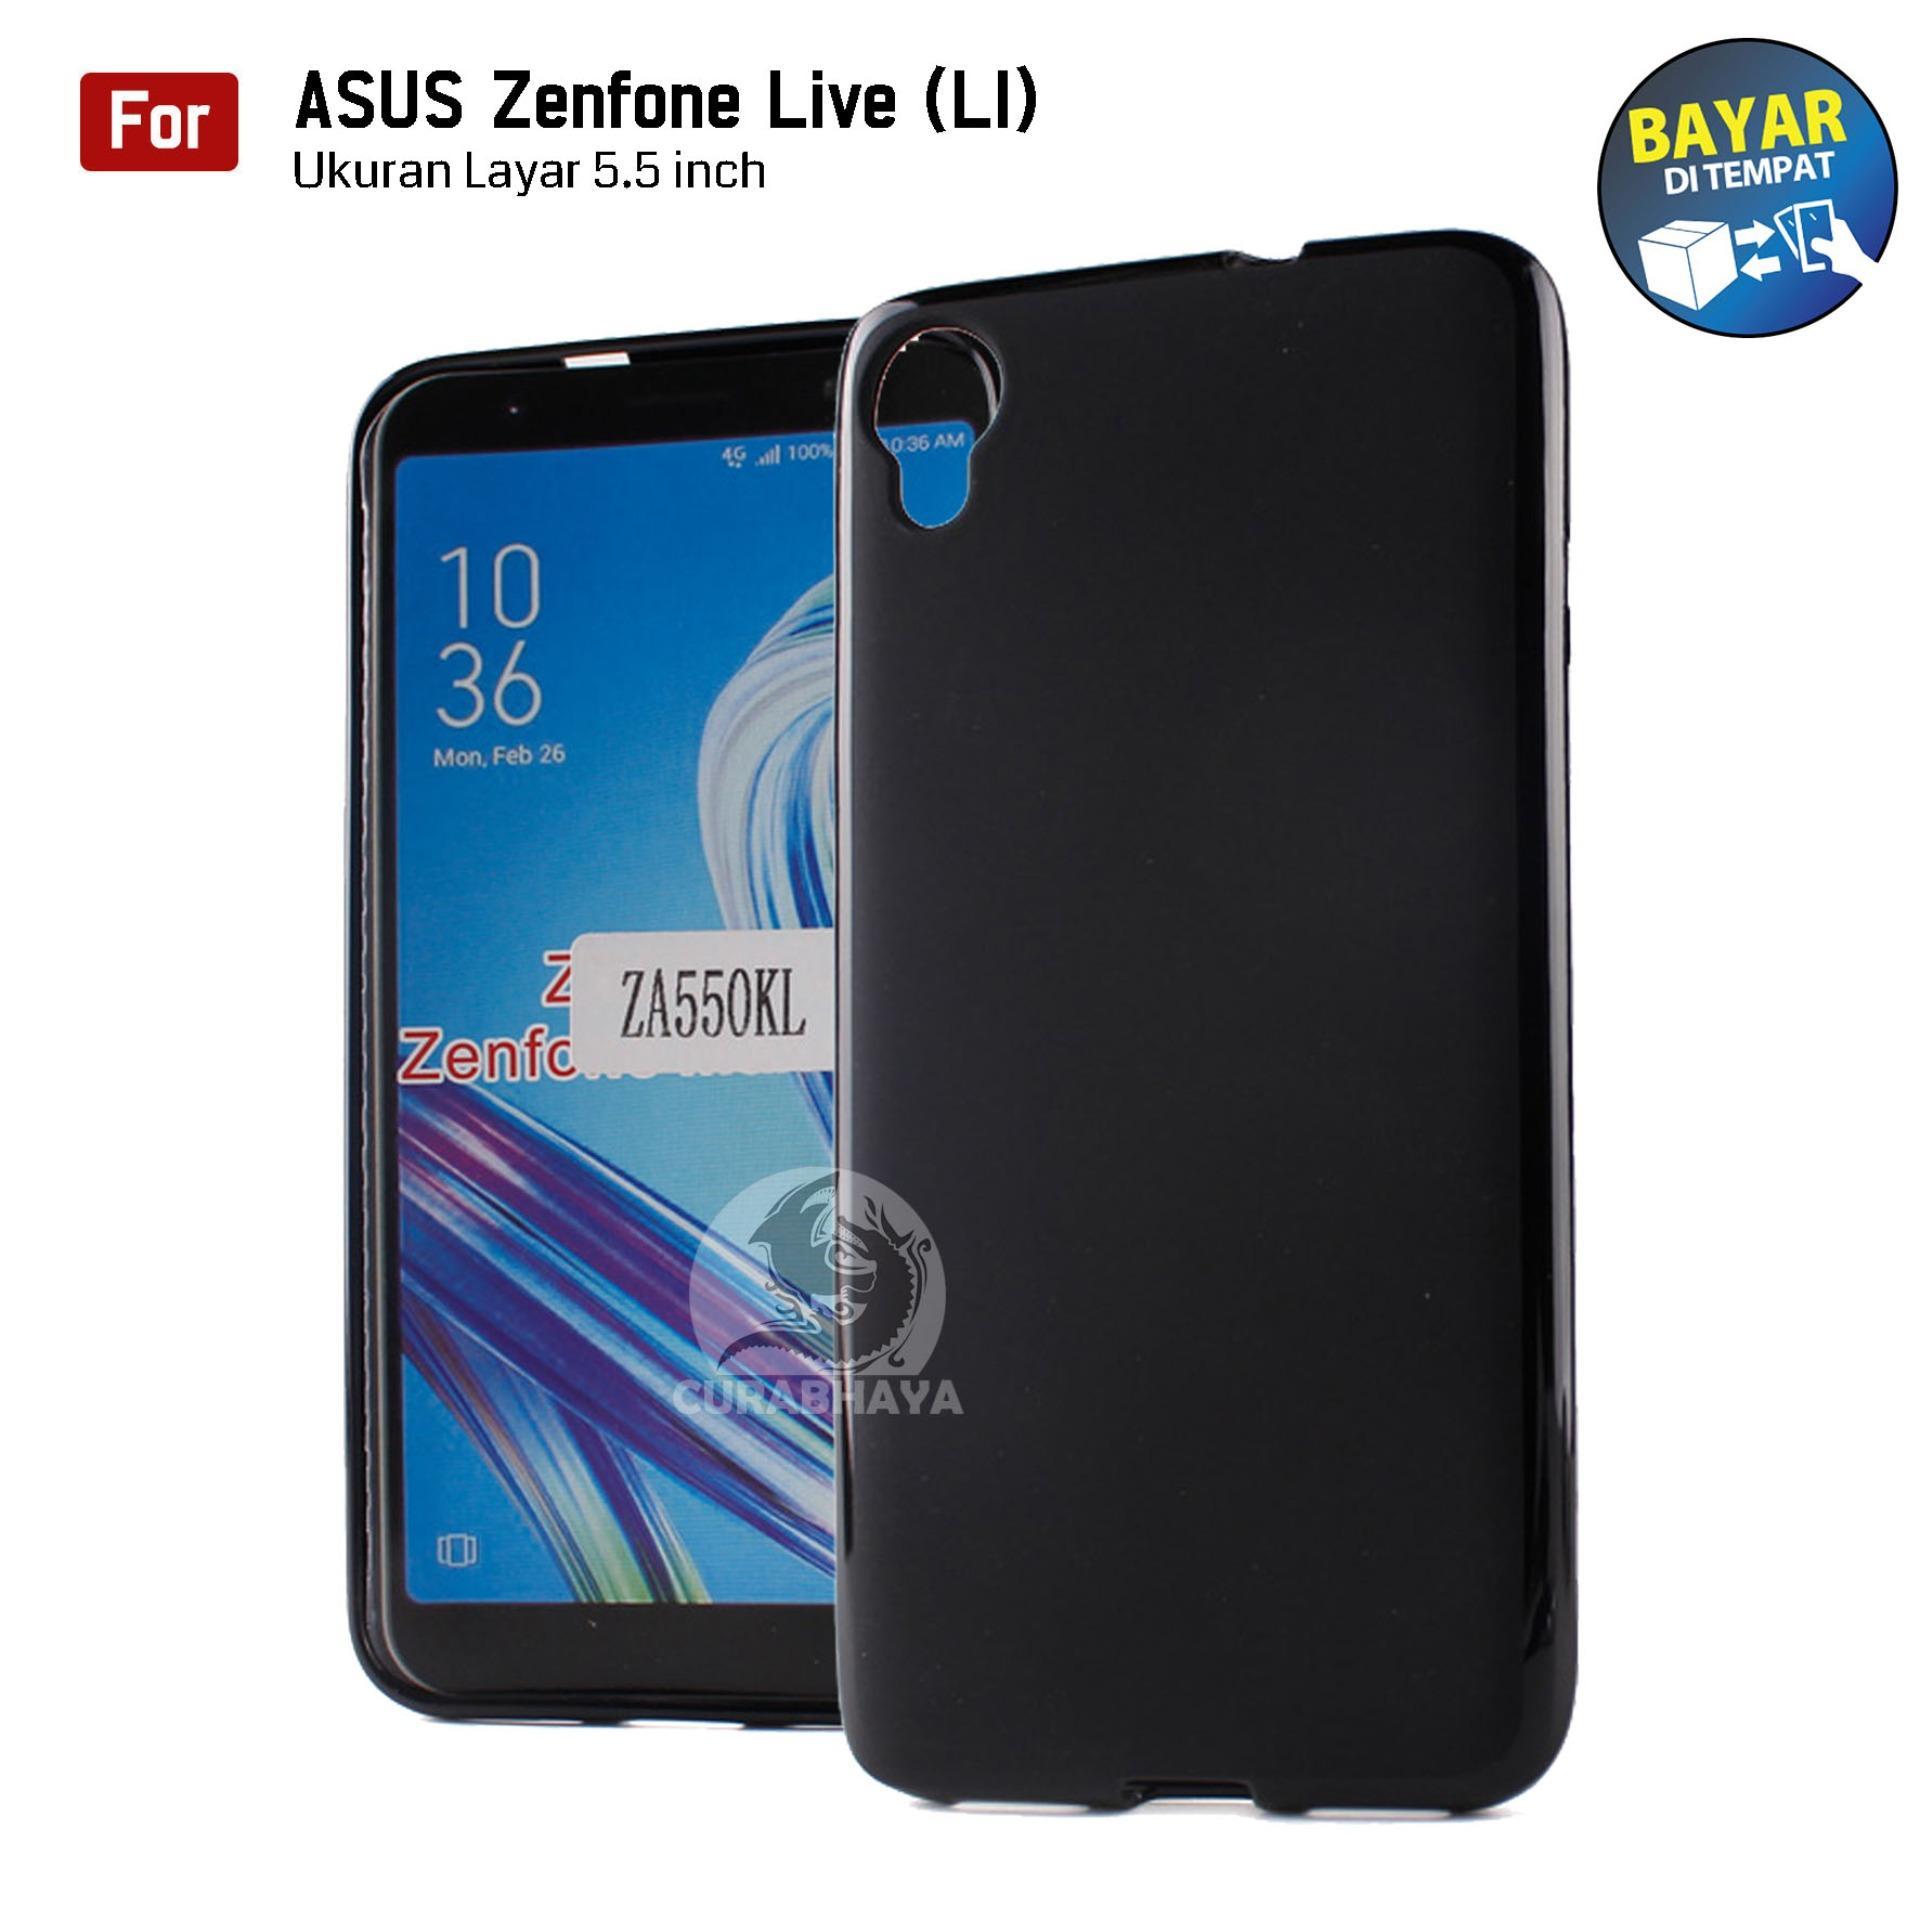 MidNight Asus Zenfone Live (L1) / ZA550L | Slim Case Black Matte Softcase Premium Baby Skin - Hitam